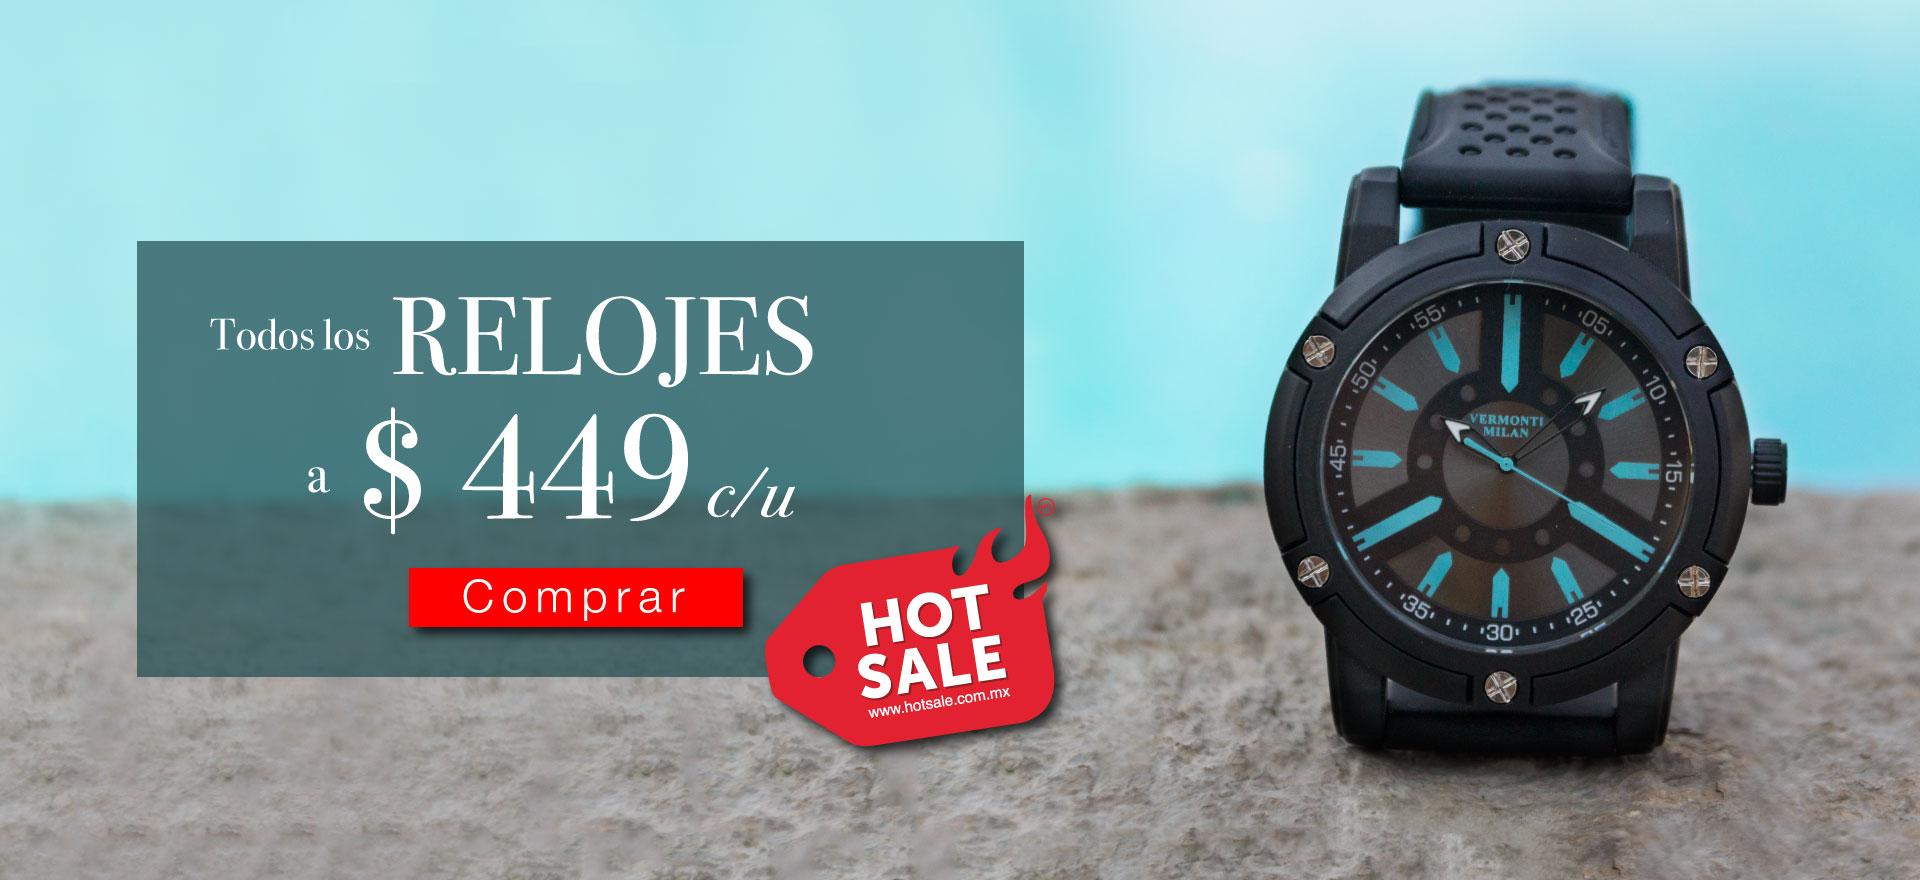 Hot Sale Relojes